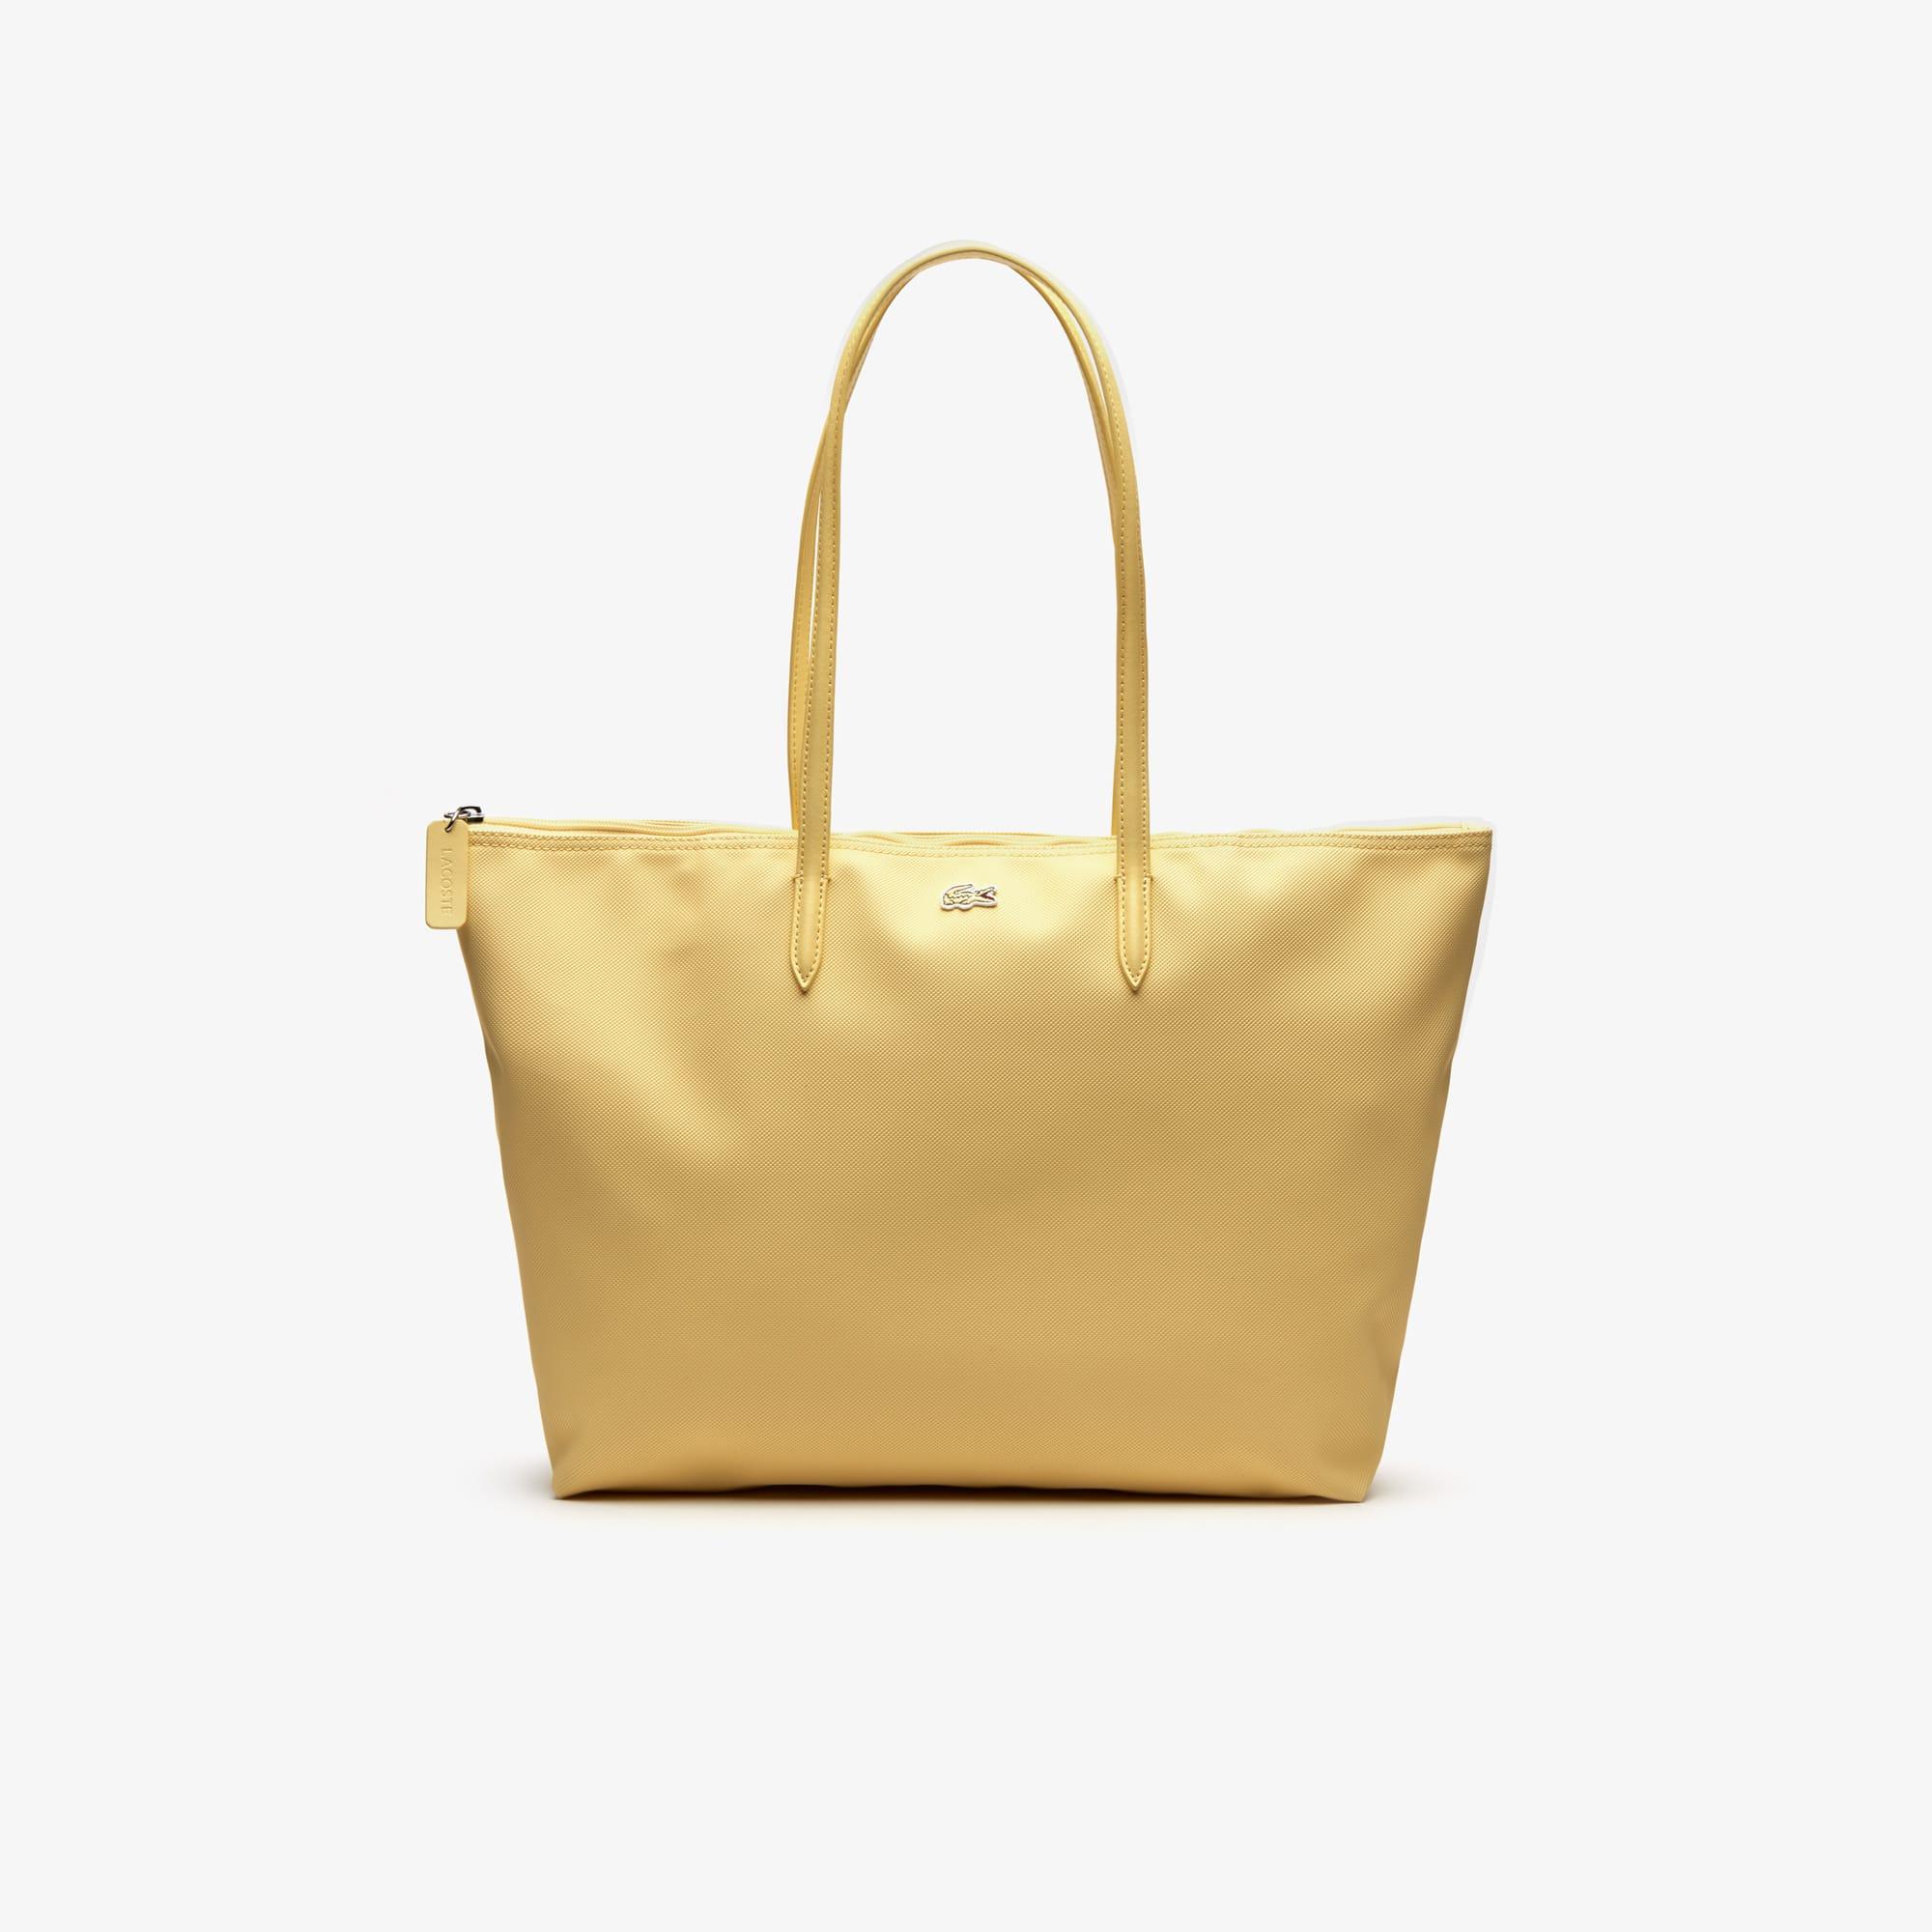 Les sacs   Maroquinerie   LACOSTE f5a1d59ea755